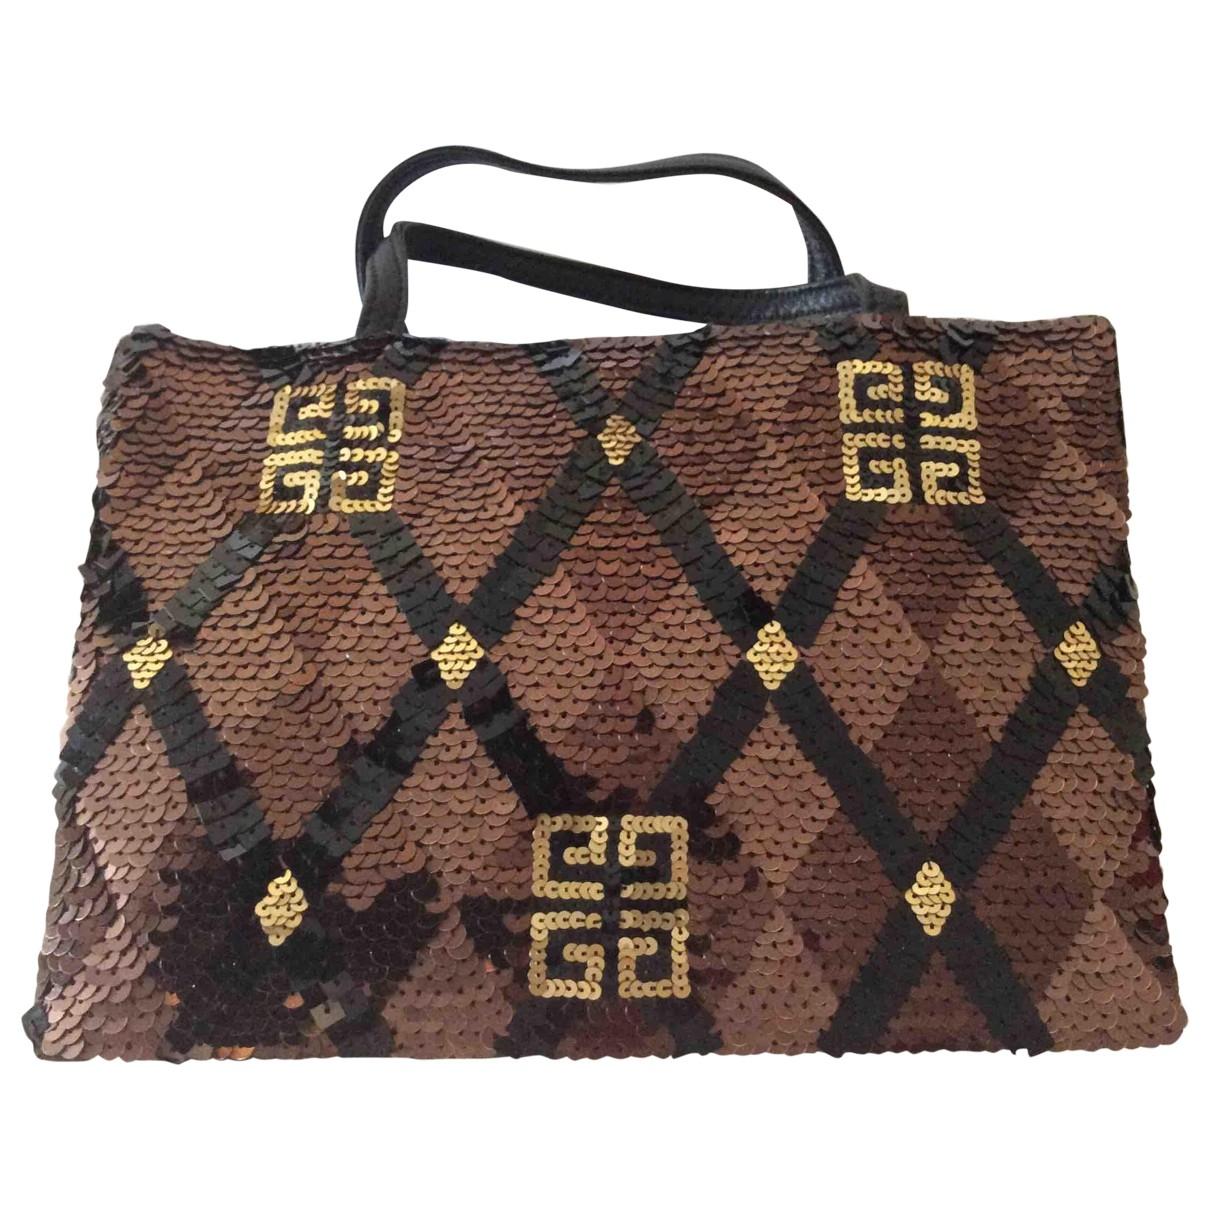 Givenchy \N Multicolour Cloth handbag for Women \N